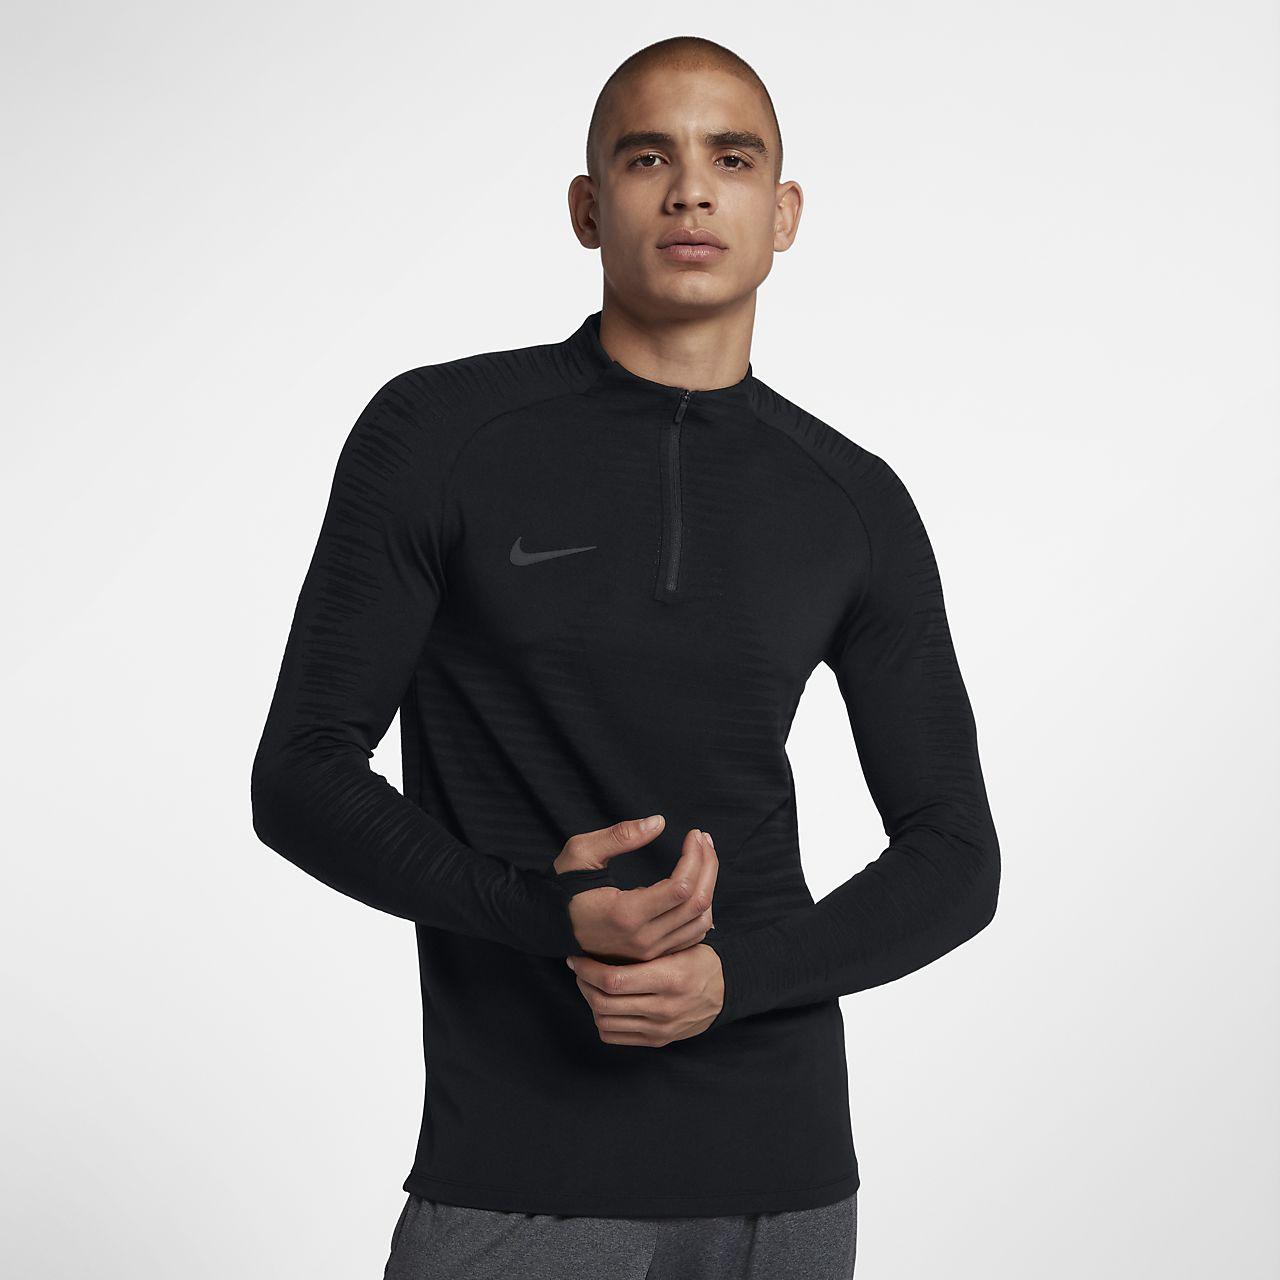 Nike VaporKnit Strike Camiseta de fútbol de manga larga - Hombre ... 4c9de2ff28b65